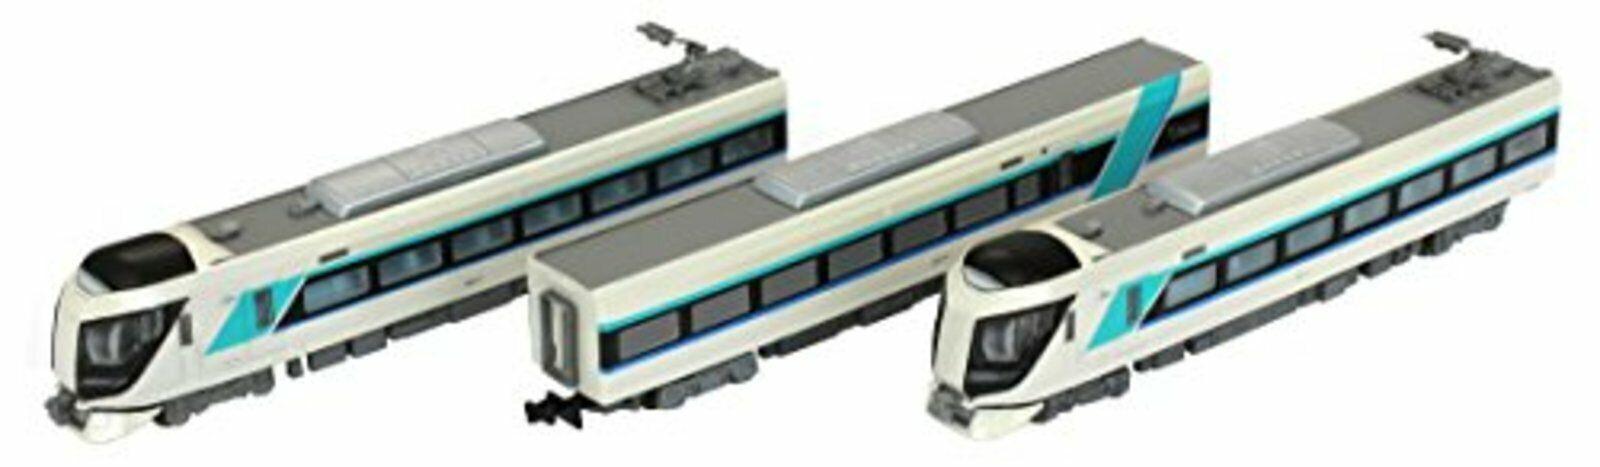 Rokuhan Z Calibre - T034-2 Tobu 500 Serie Tren Express Liberty Aizu 3 Tren F   S